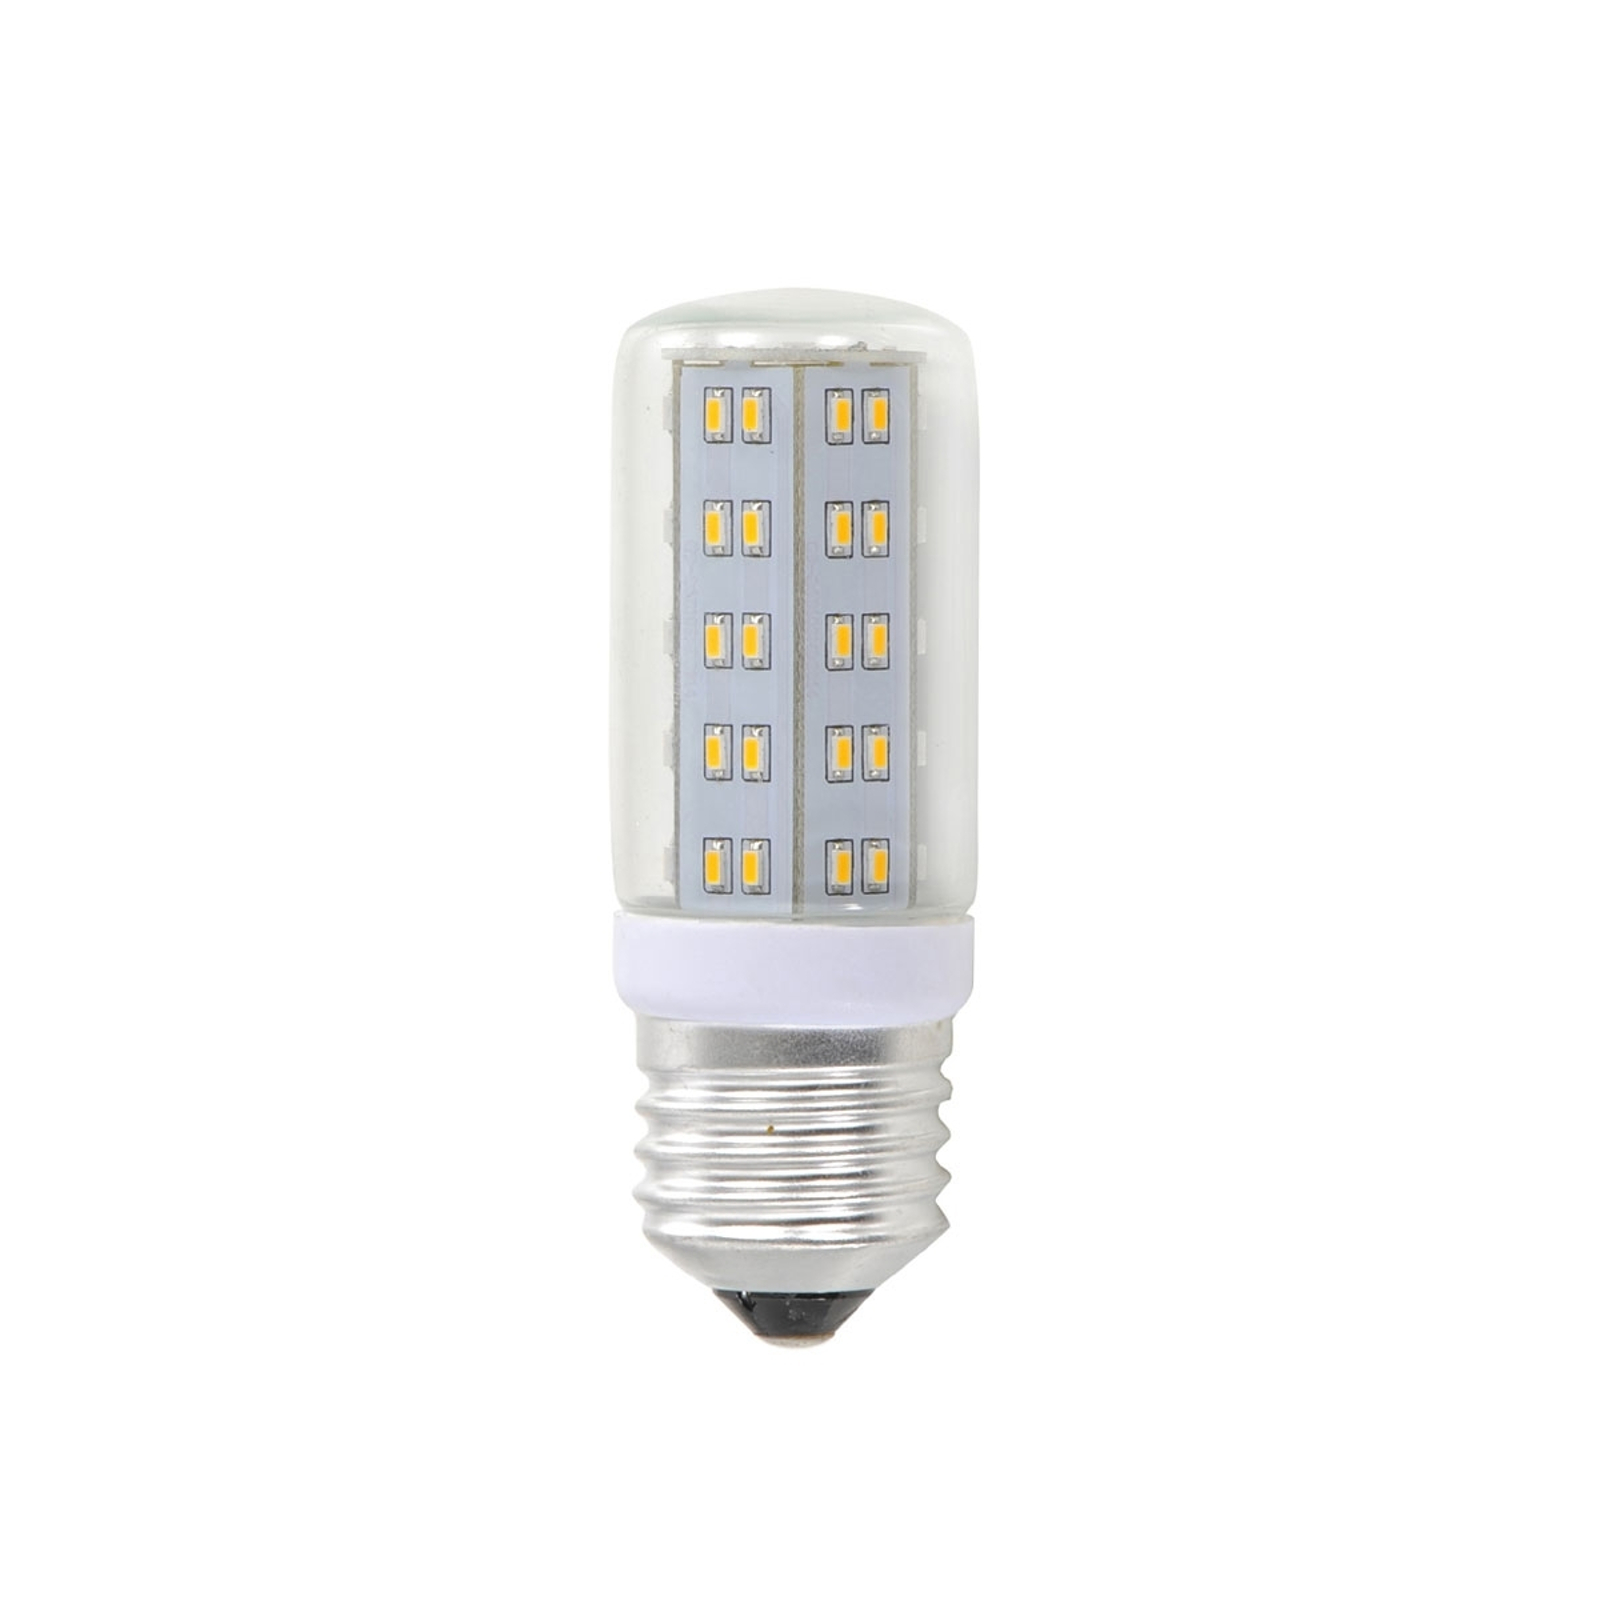 Żarówka LED E27 3,8 W z diodami SMD